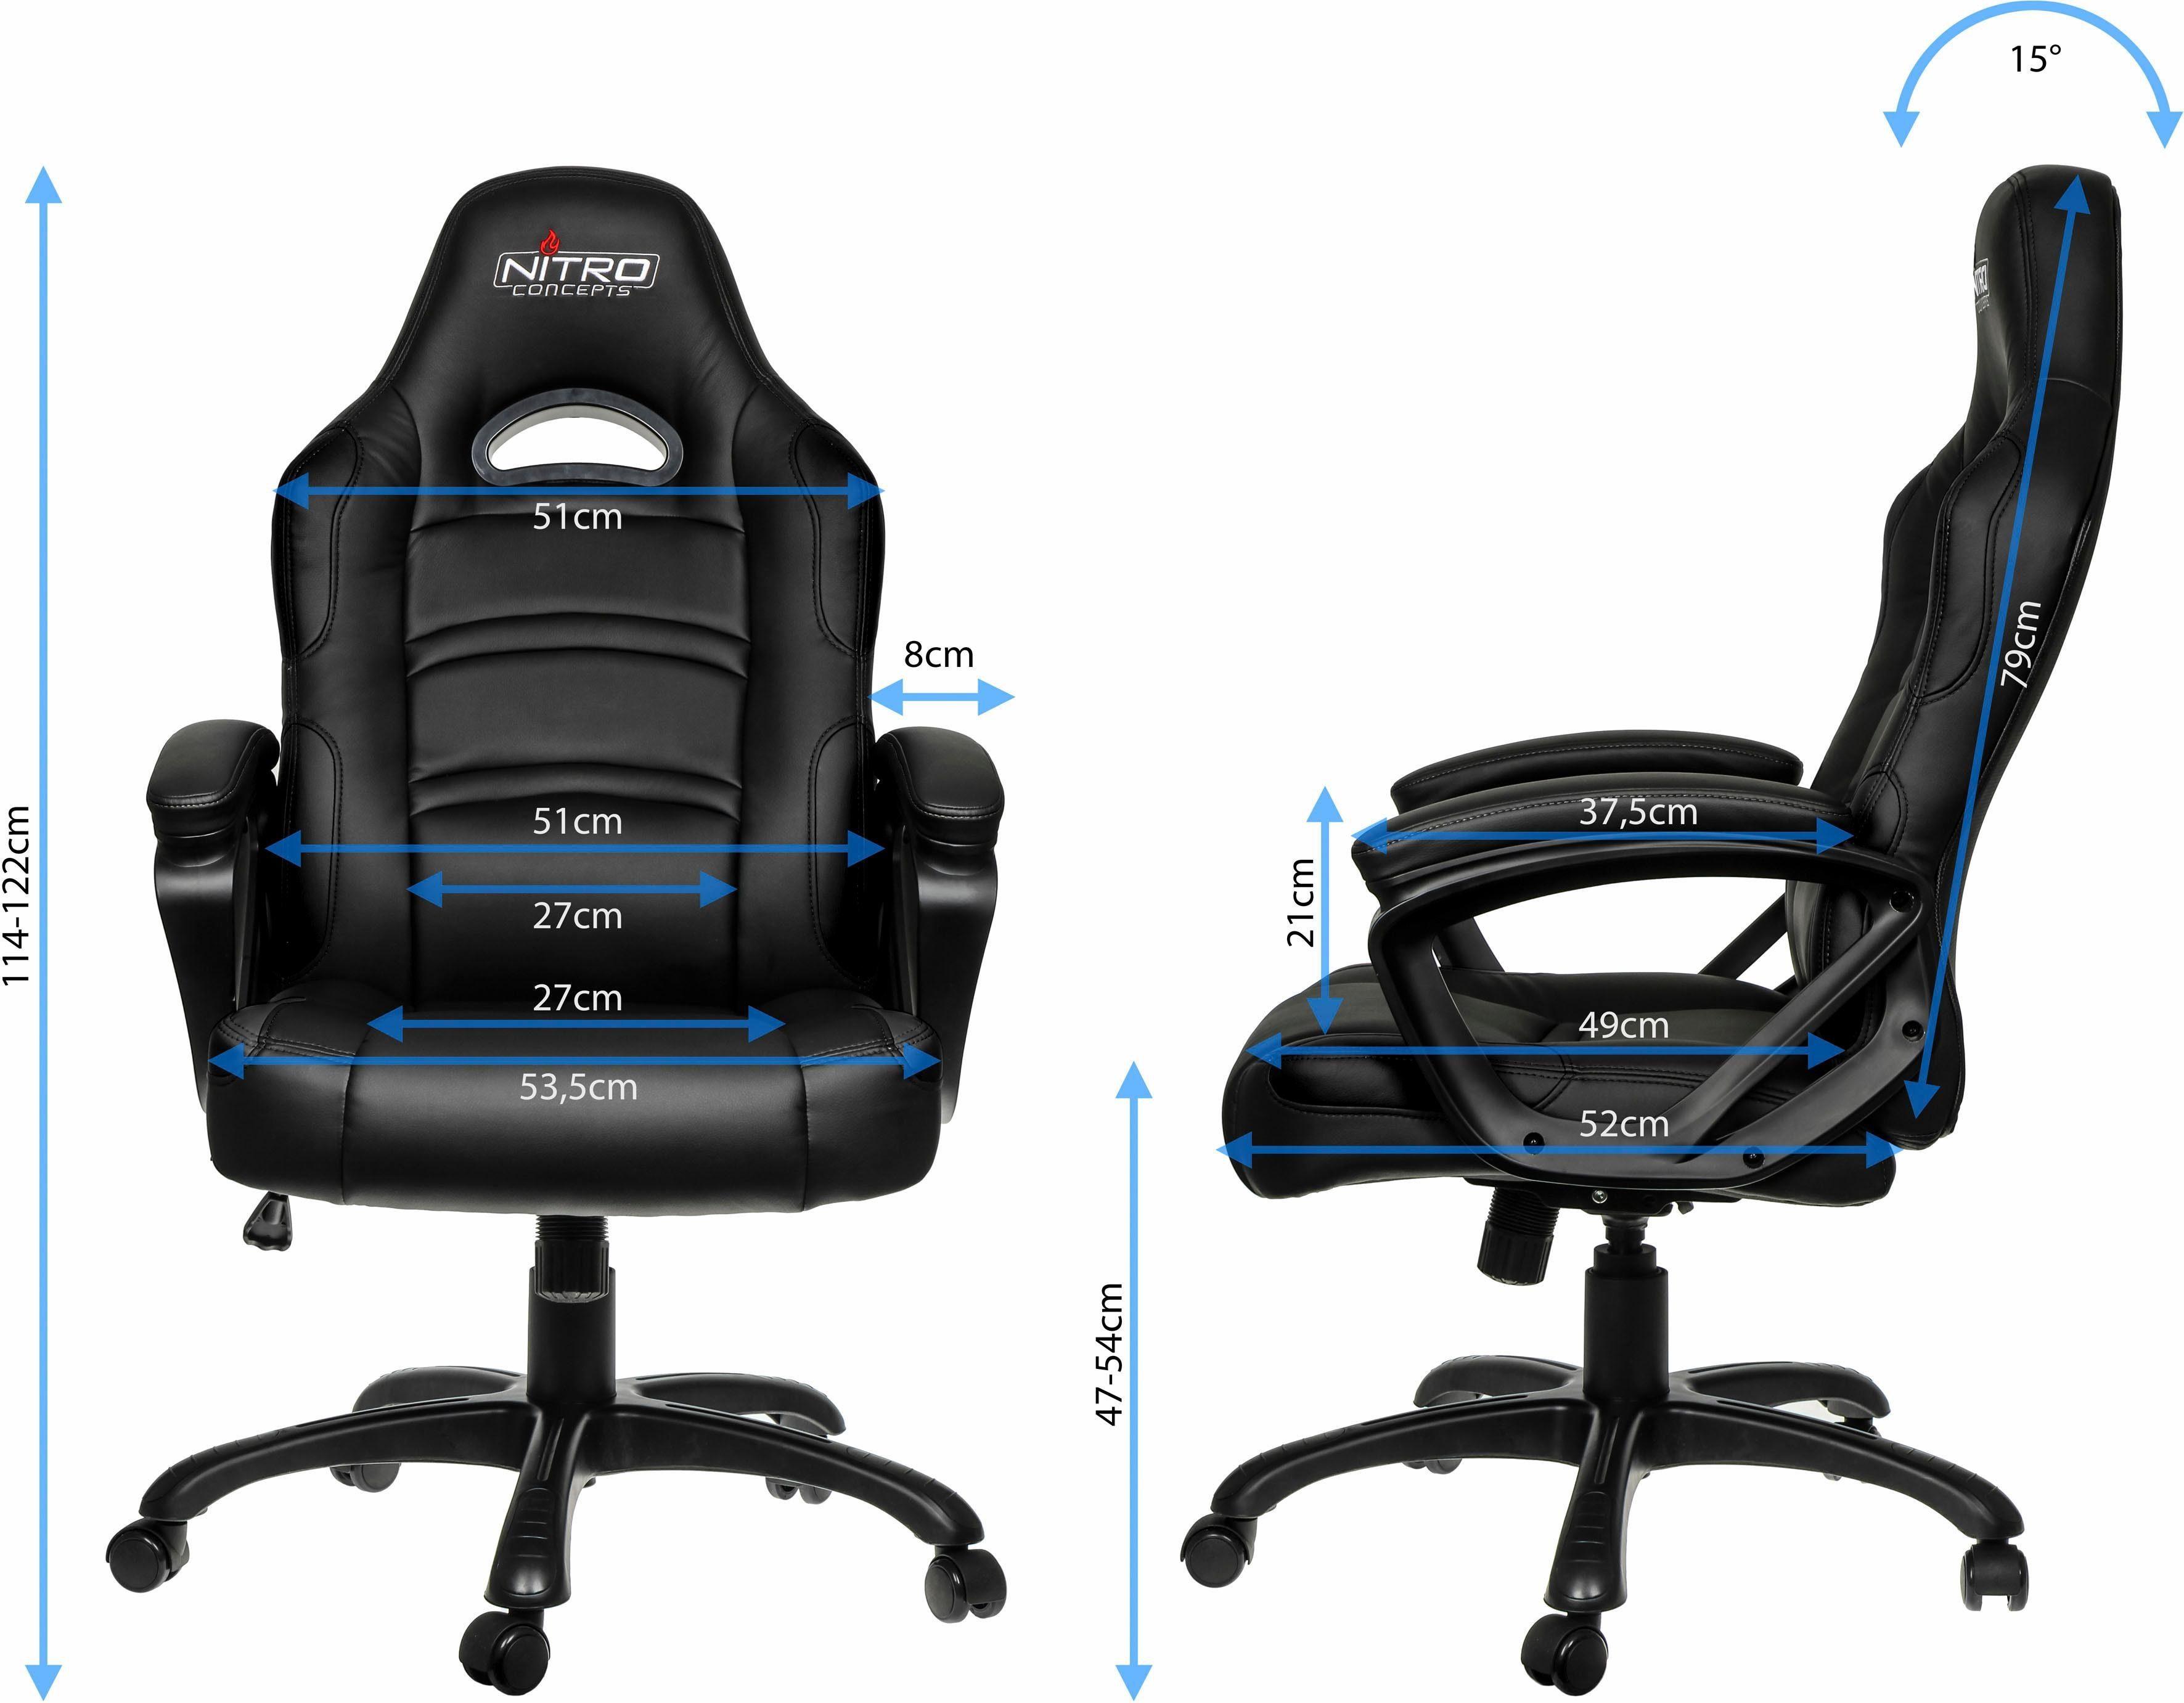 Nitro chairs c comfort gaming stoel online kopen otto